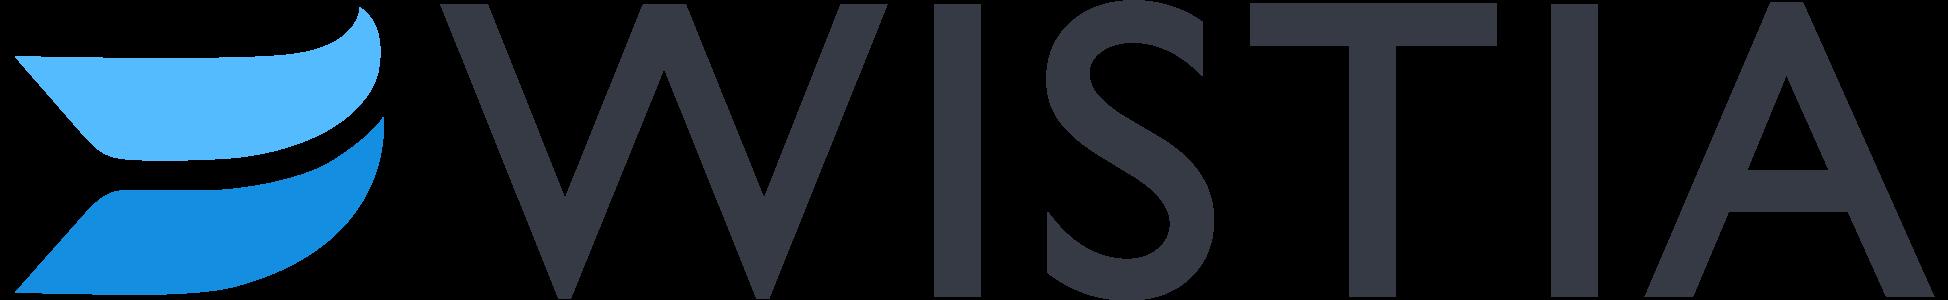 wistia-logo-full.png